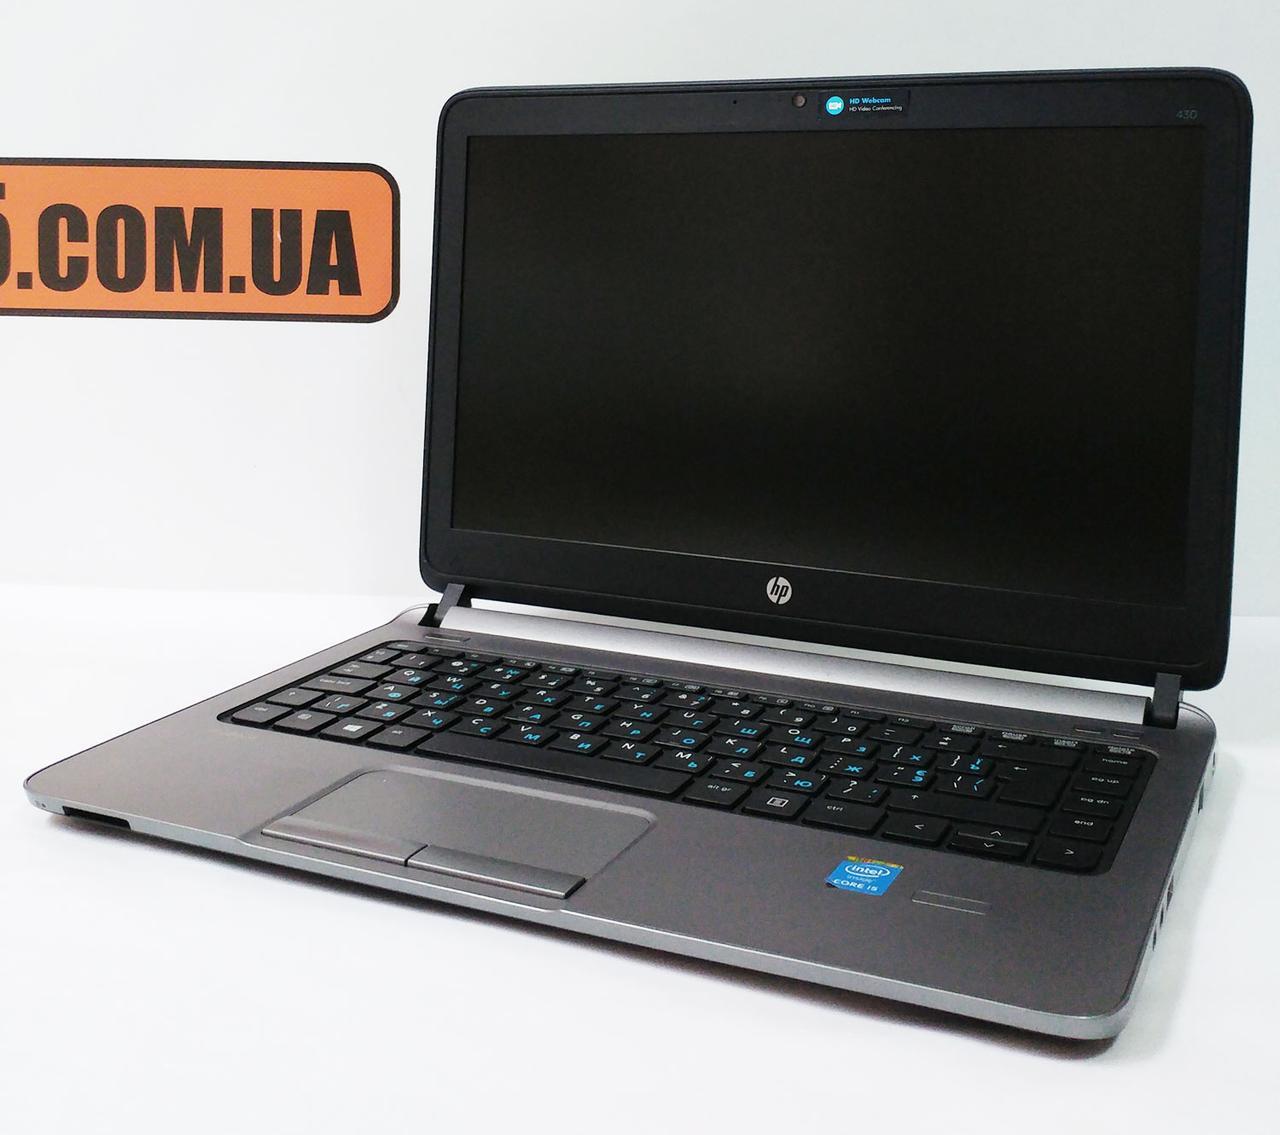 "Ноутбук HP ProBook 430 G1, 13.3"", Intel Core i5-4300U 2.9GHz, RAM 4ГБ, HDD 500ГБ, класс ""B"""